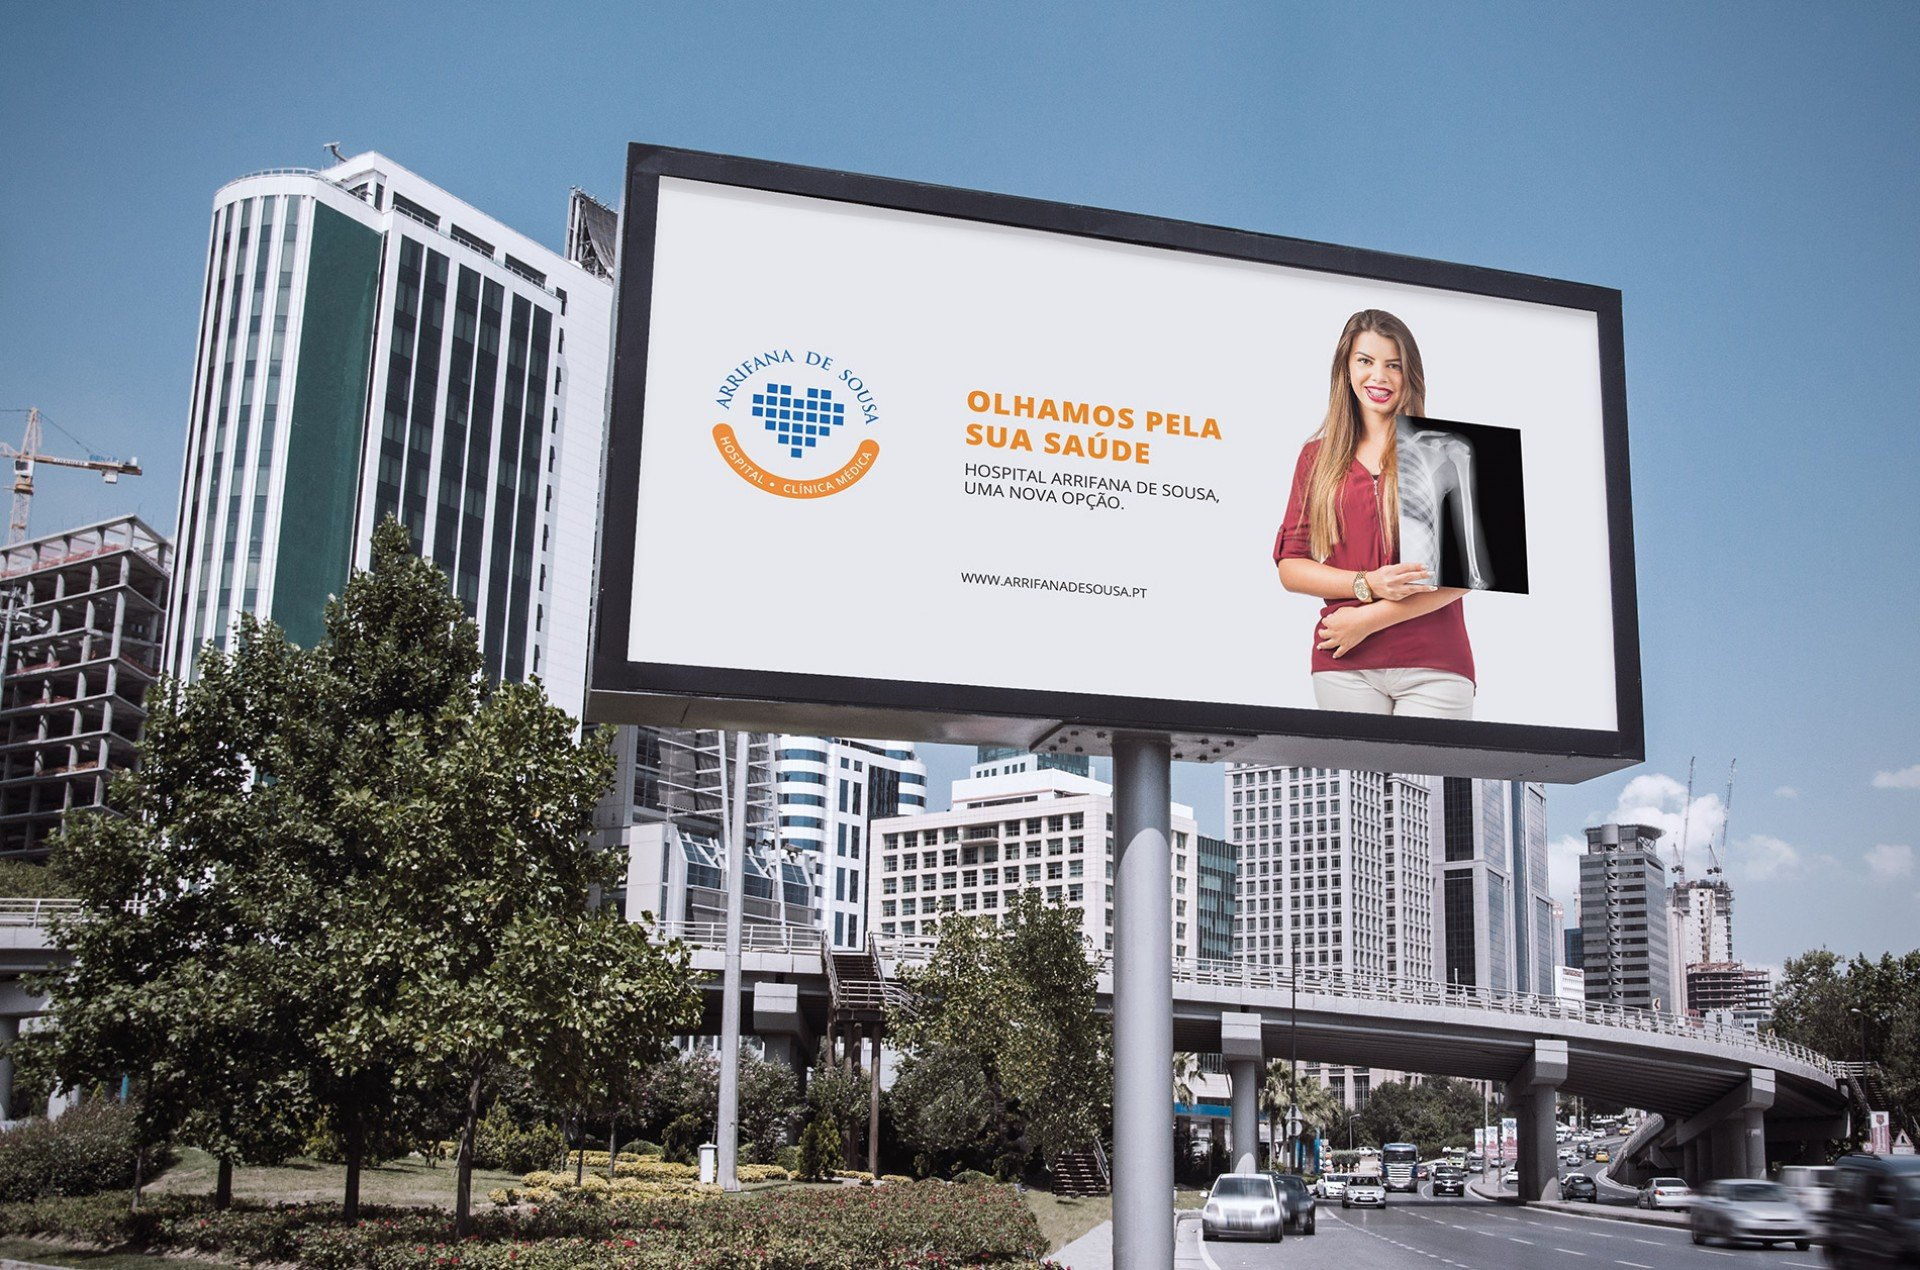 outdoor campanha hospital arrifana de sousa